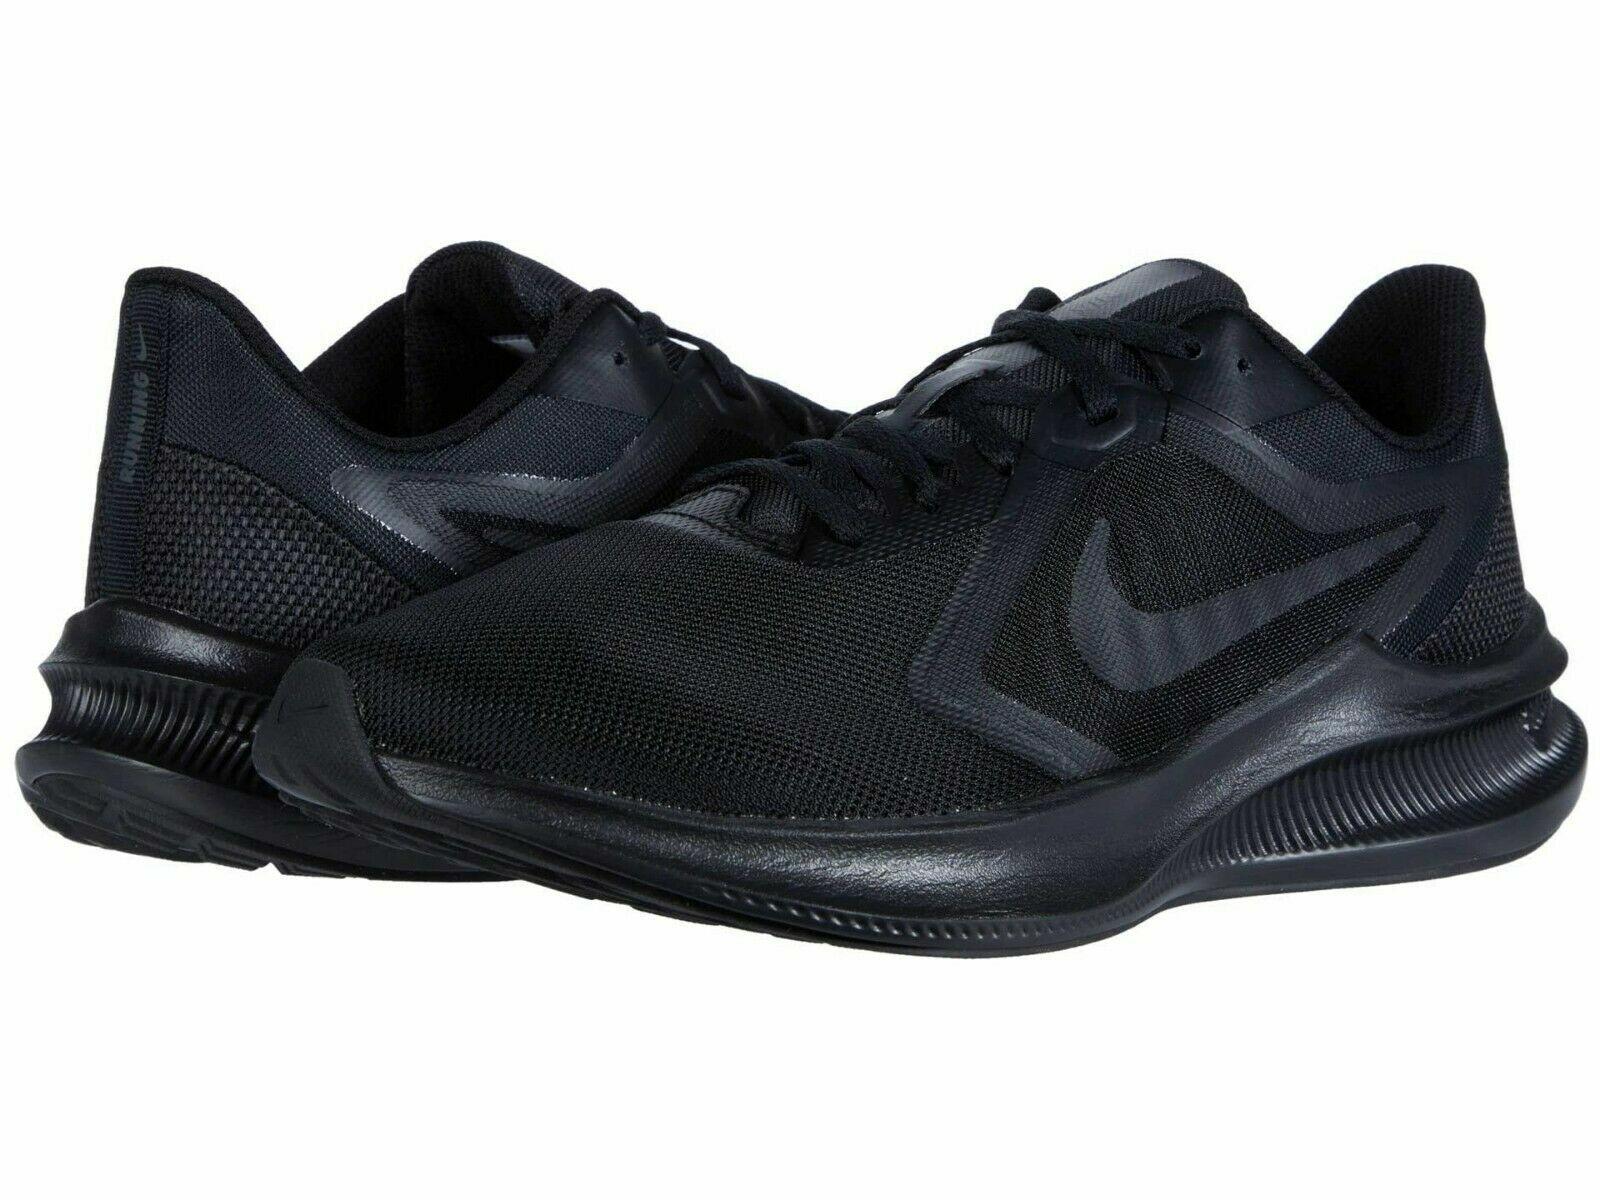 Nike Downshifter 6 Mens Black Shoes